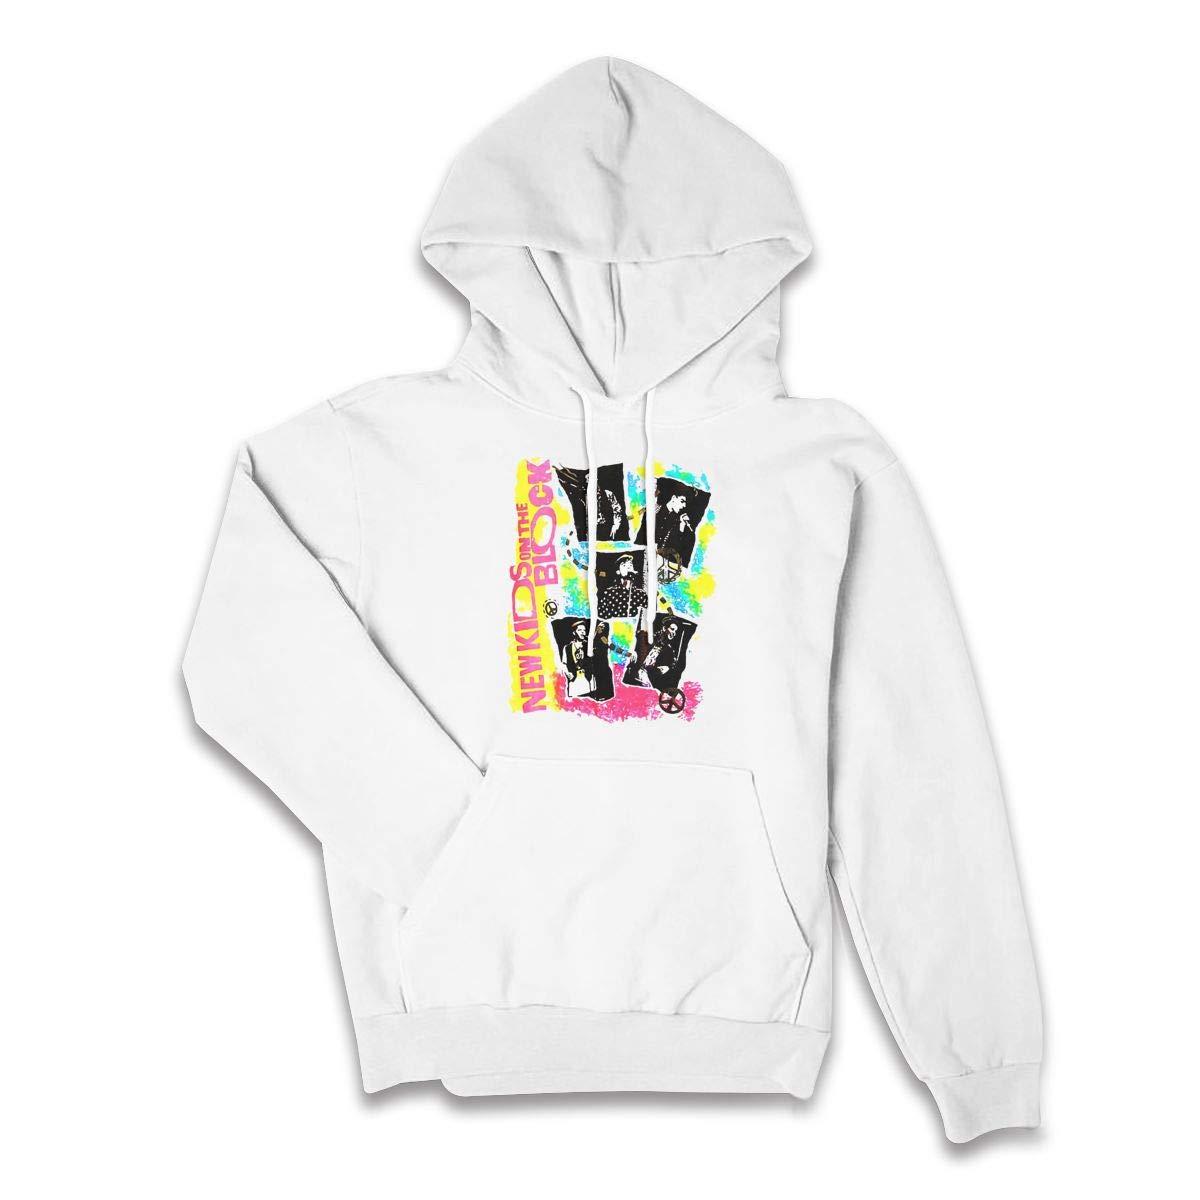 Womens Vintage 80s 90s New Kids Sweatshirt